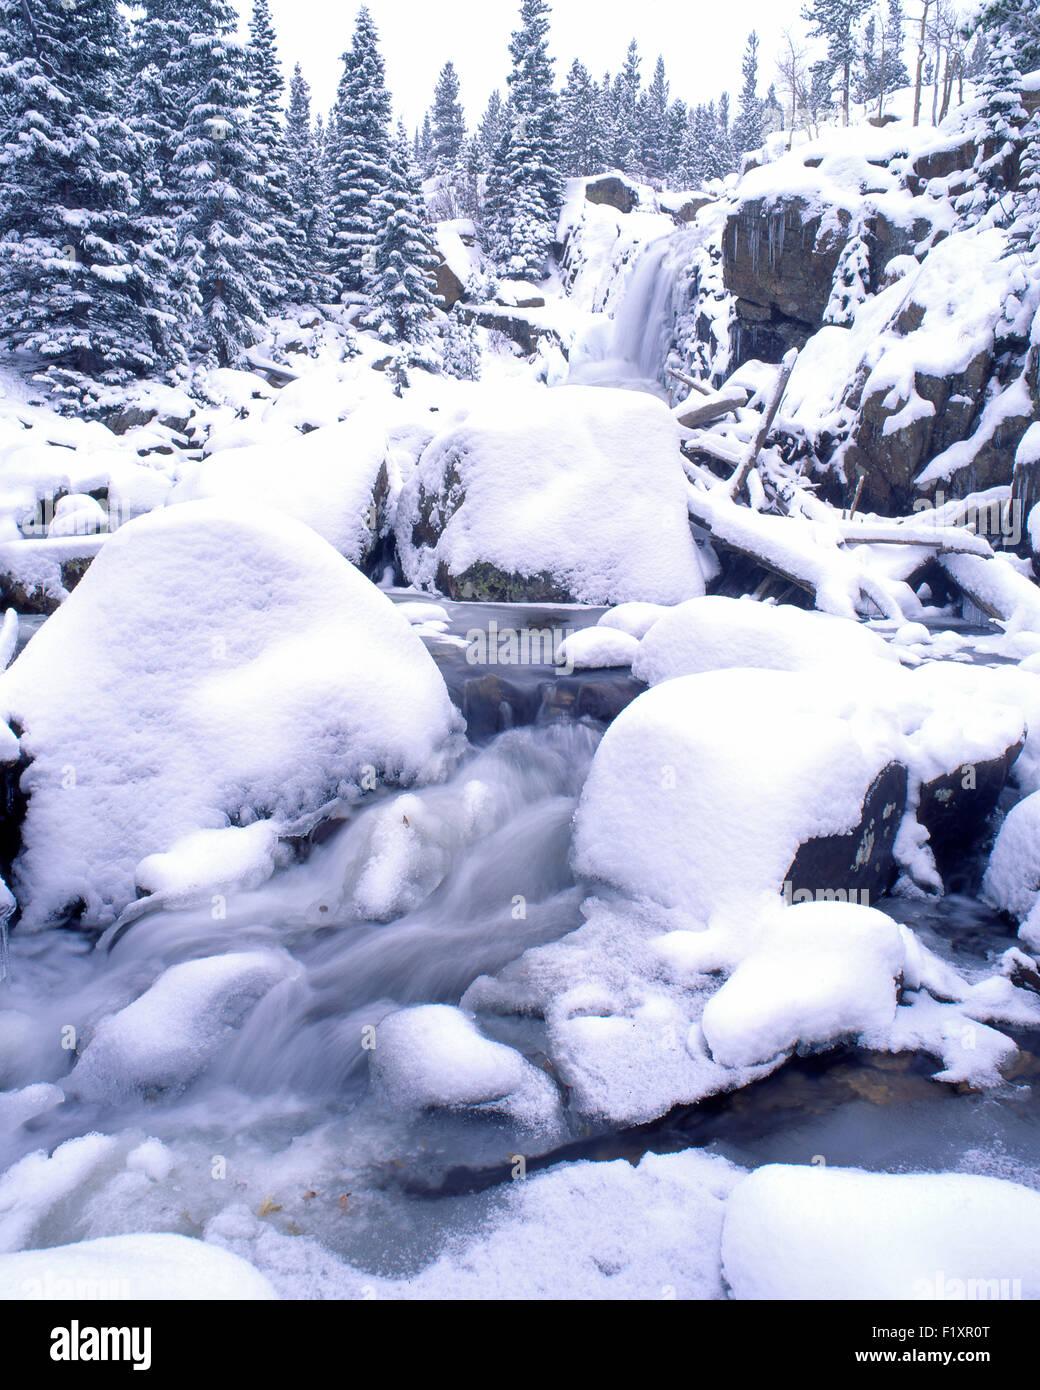 Rocky Mountain National Park - Stock Image